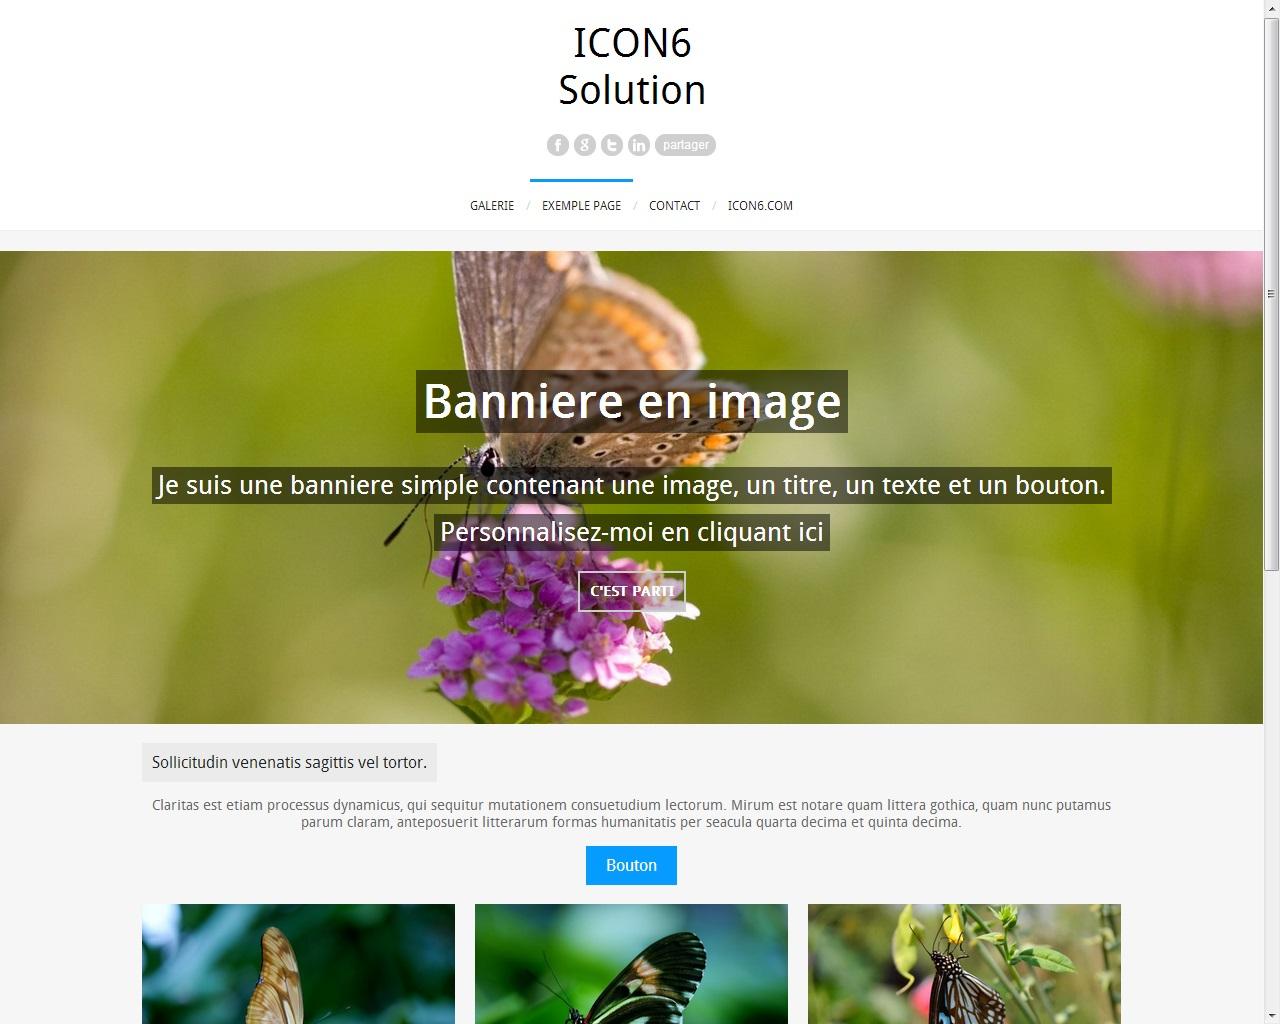 image icon6